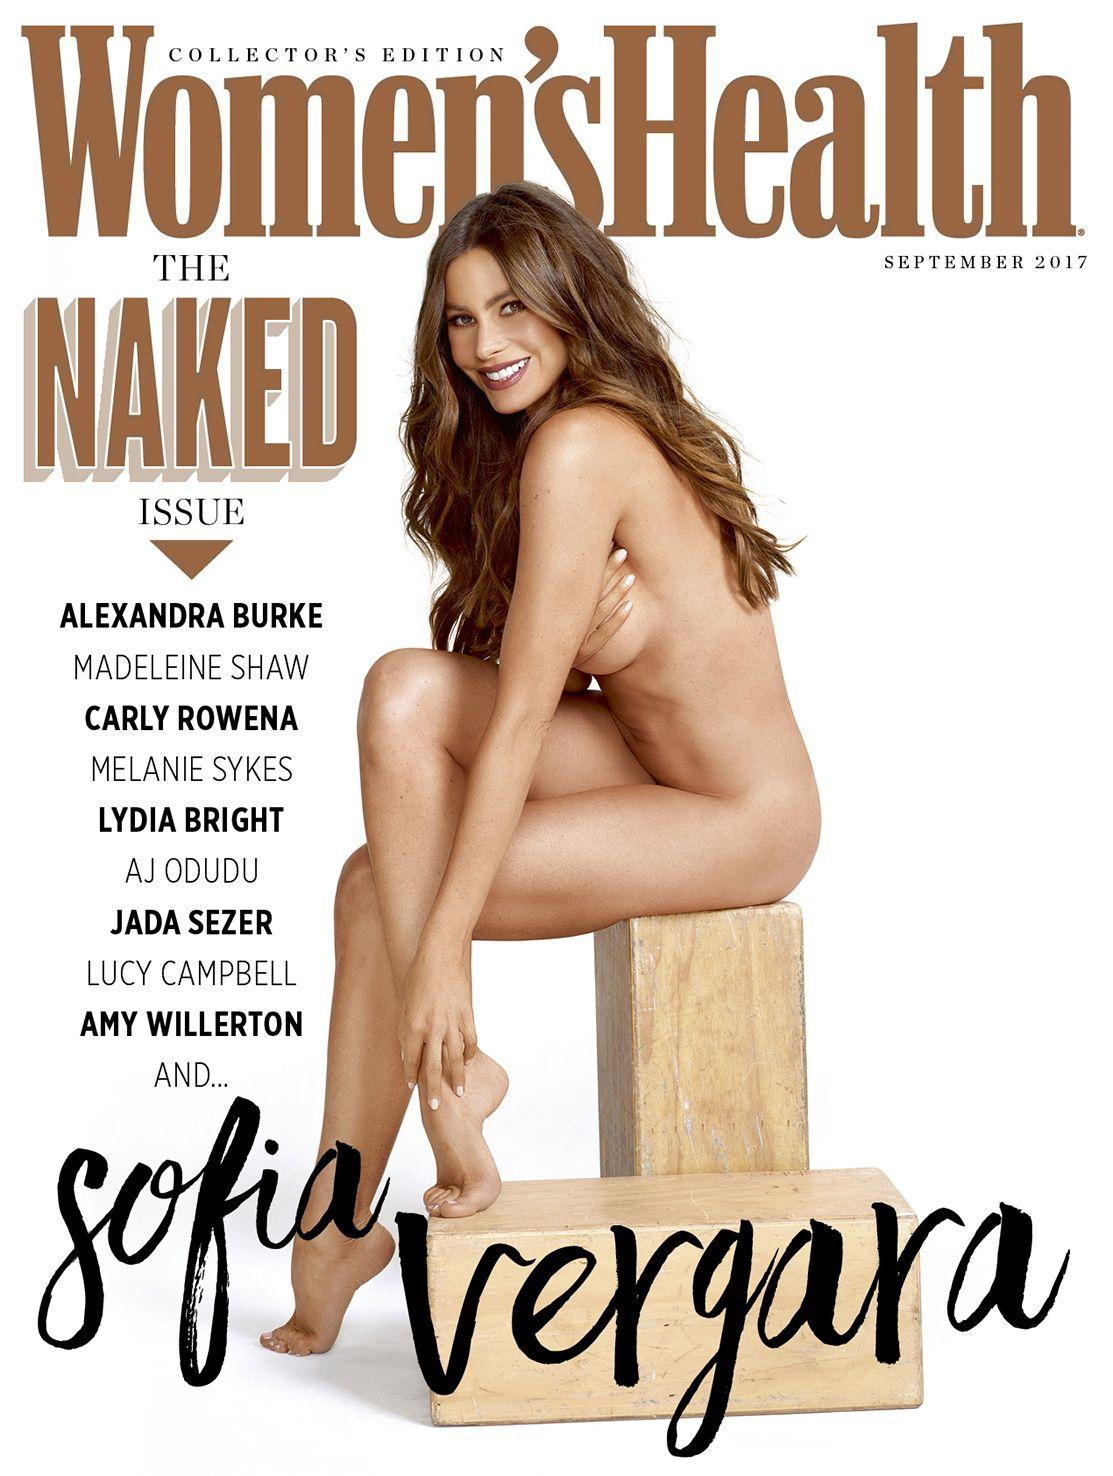 Nude men on mediatakeout